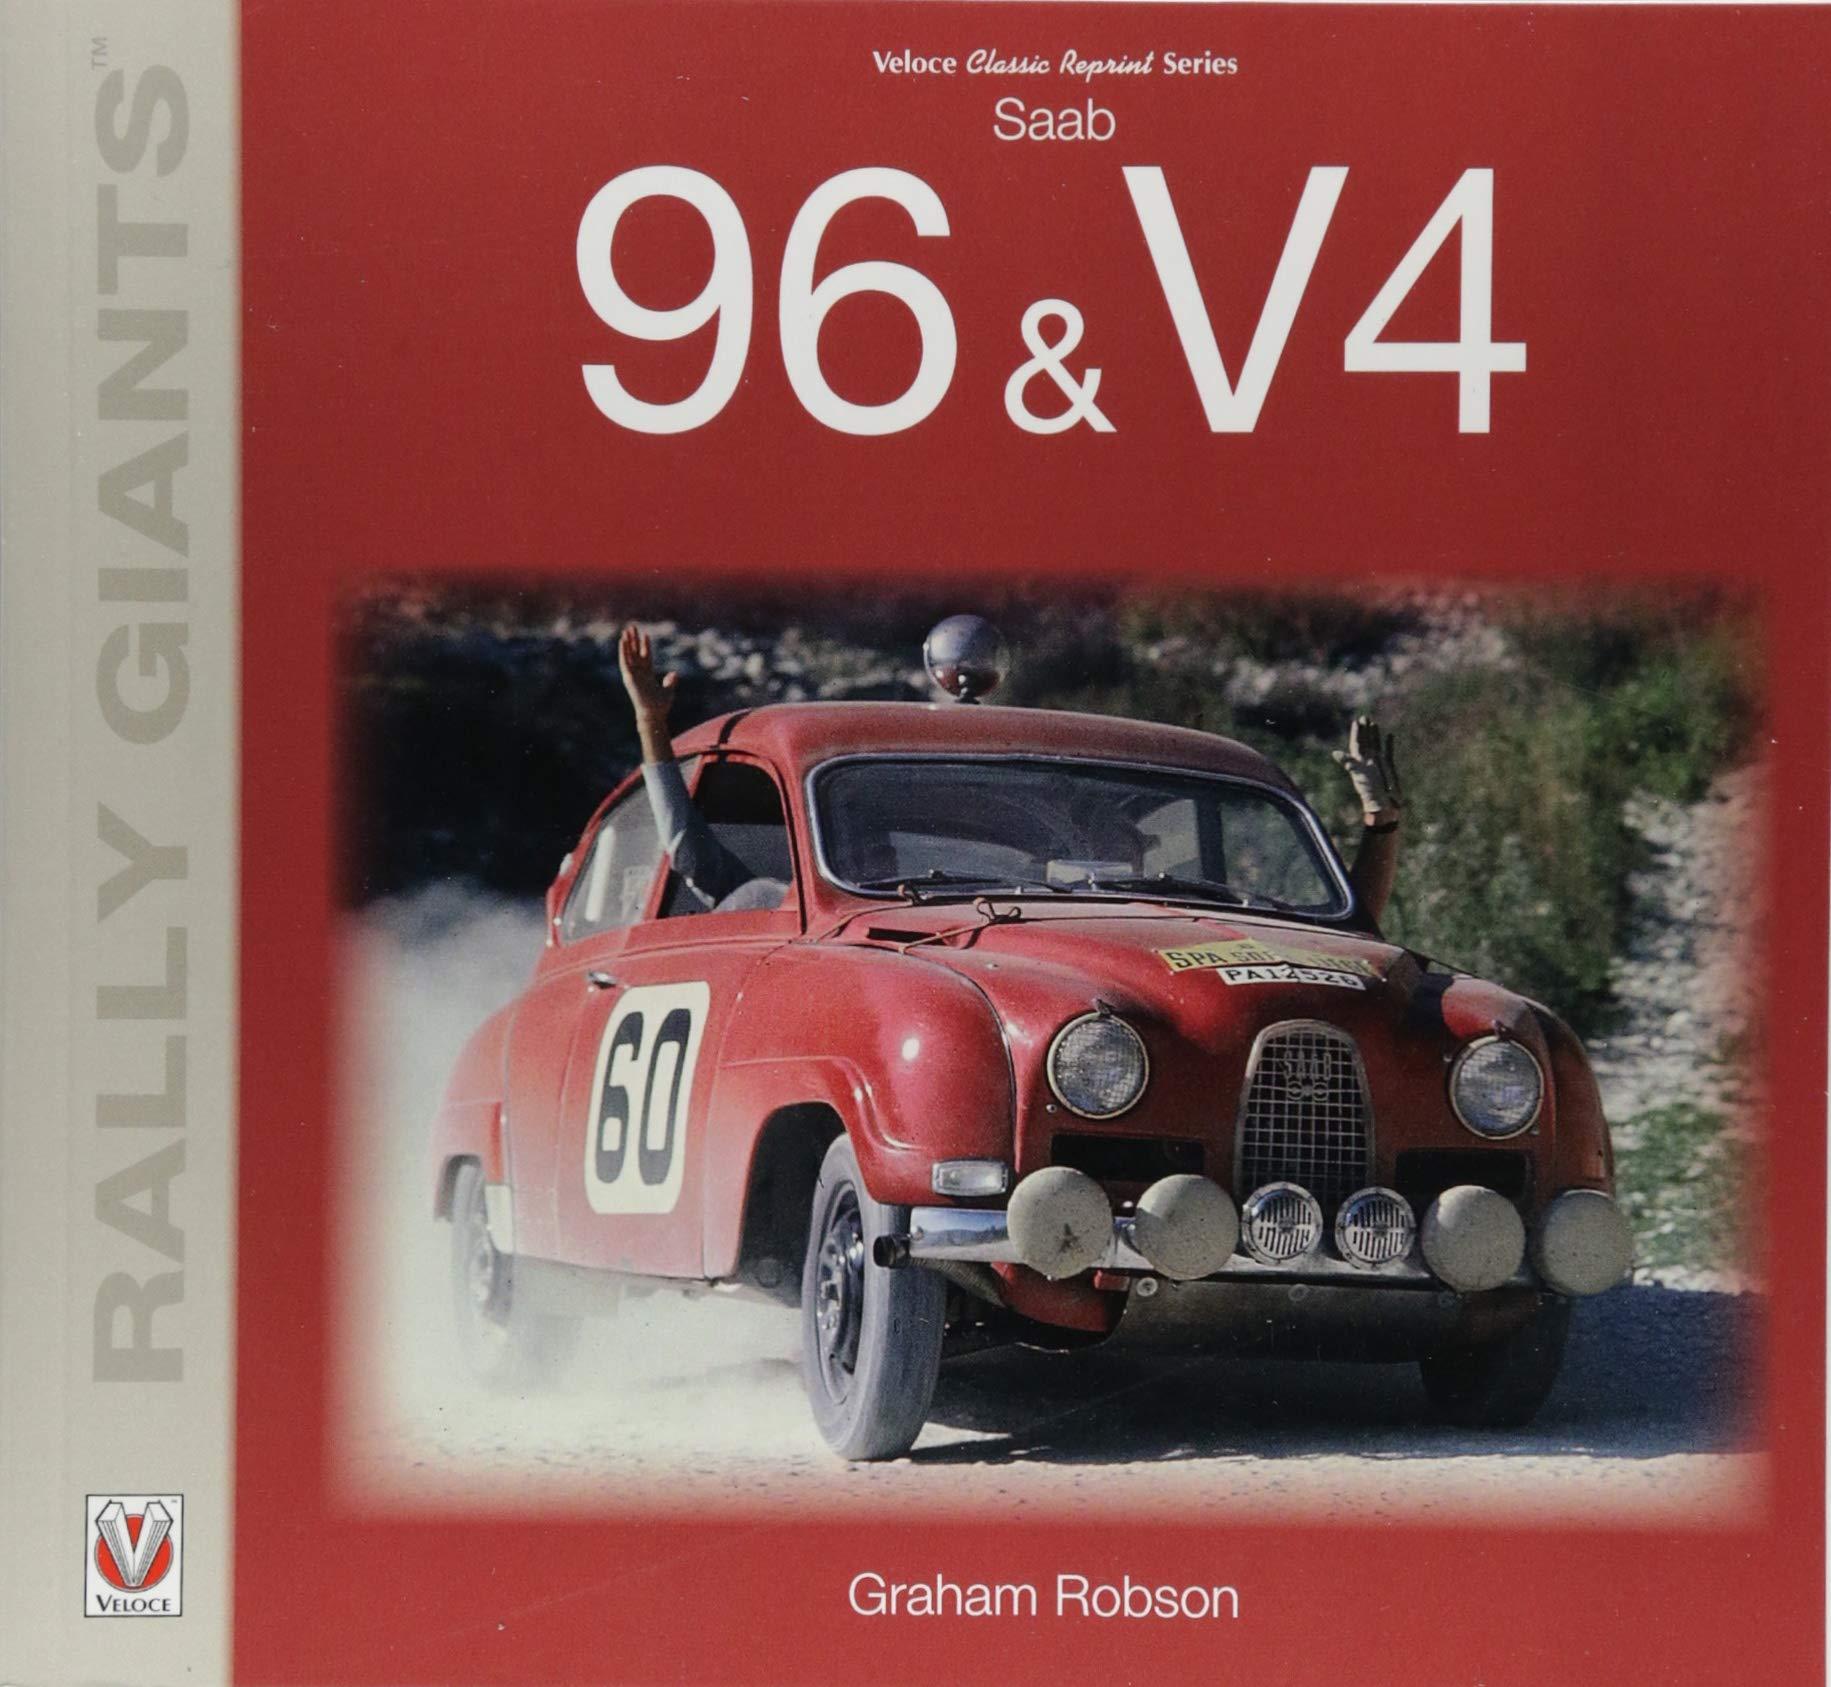 SAAB 96 & V4 (Rally Giants): Amazon.es: Graham Robson: Libros en idiomas extranjeros